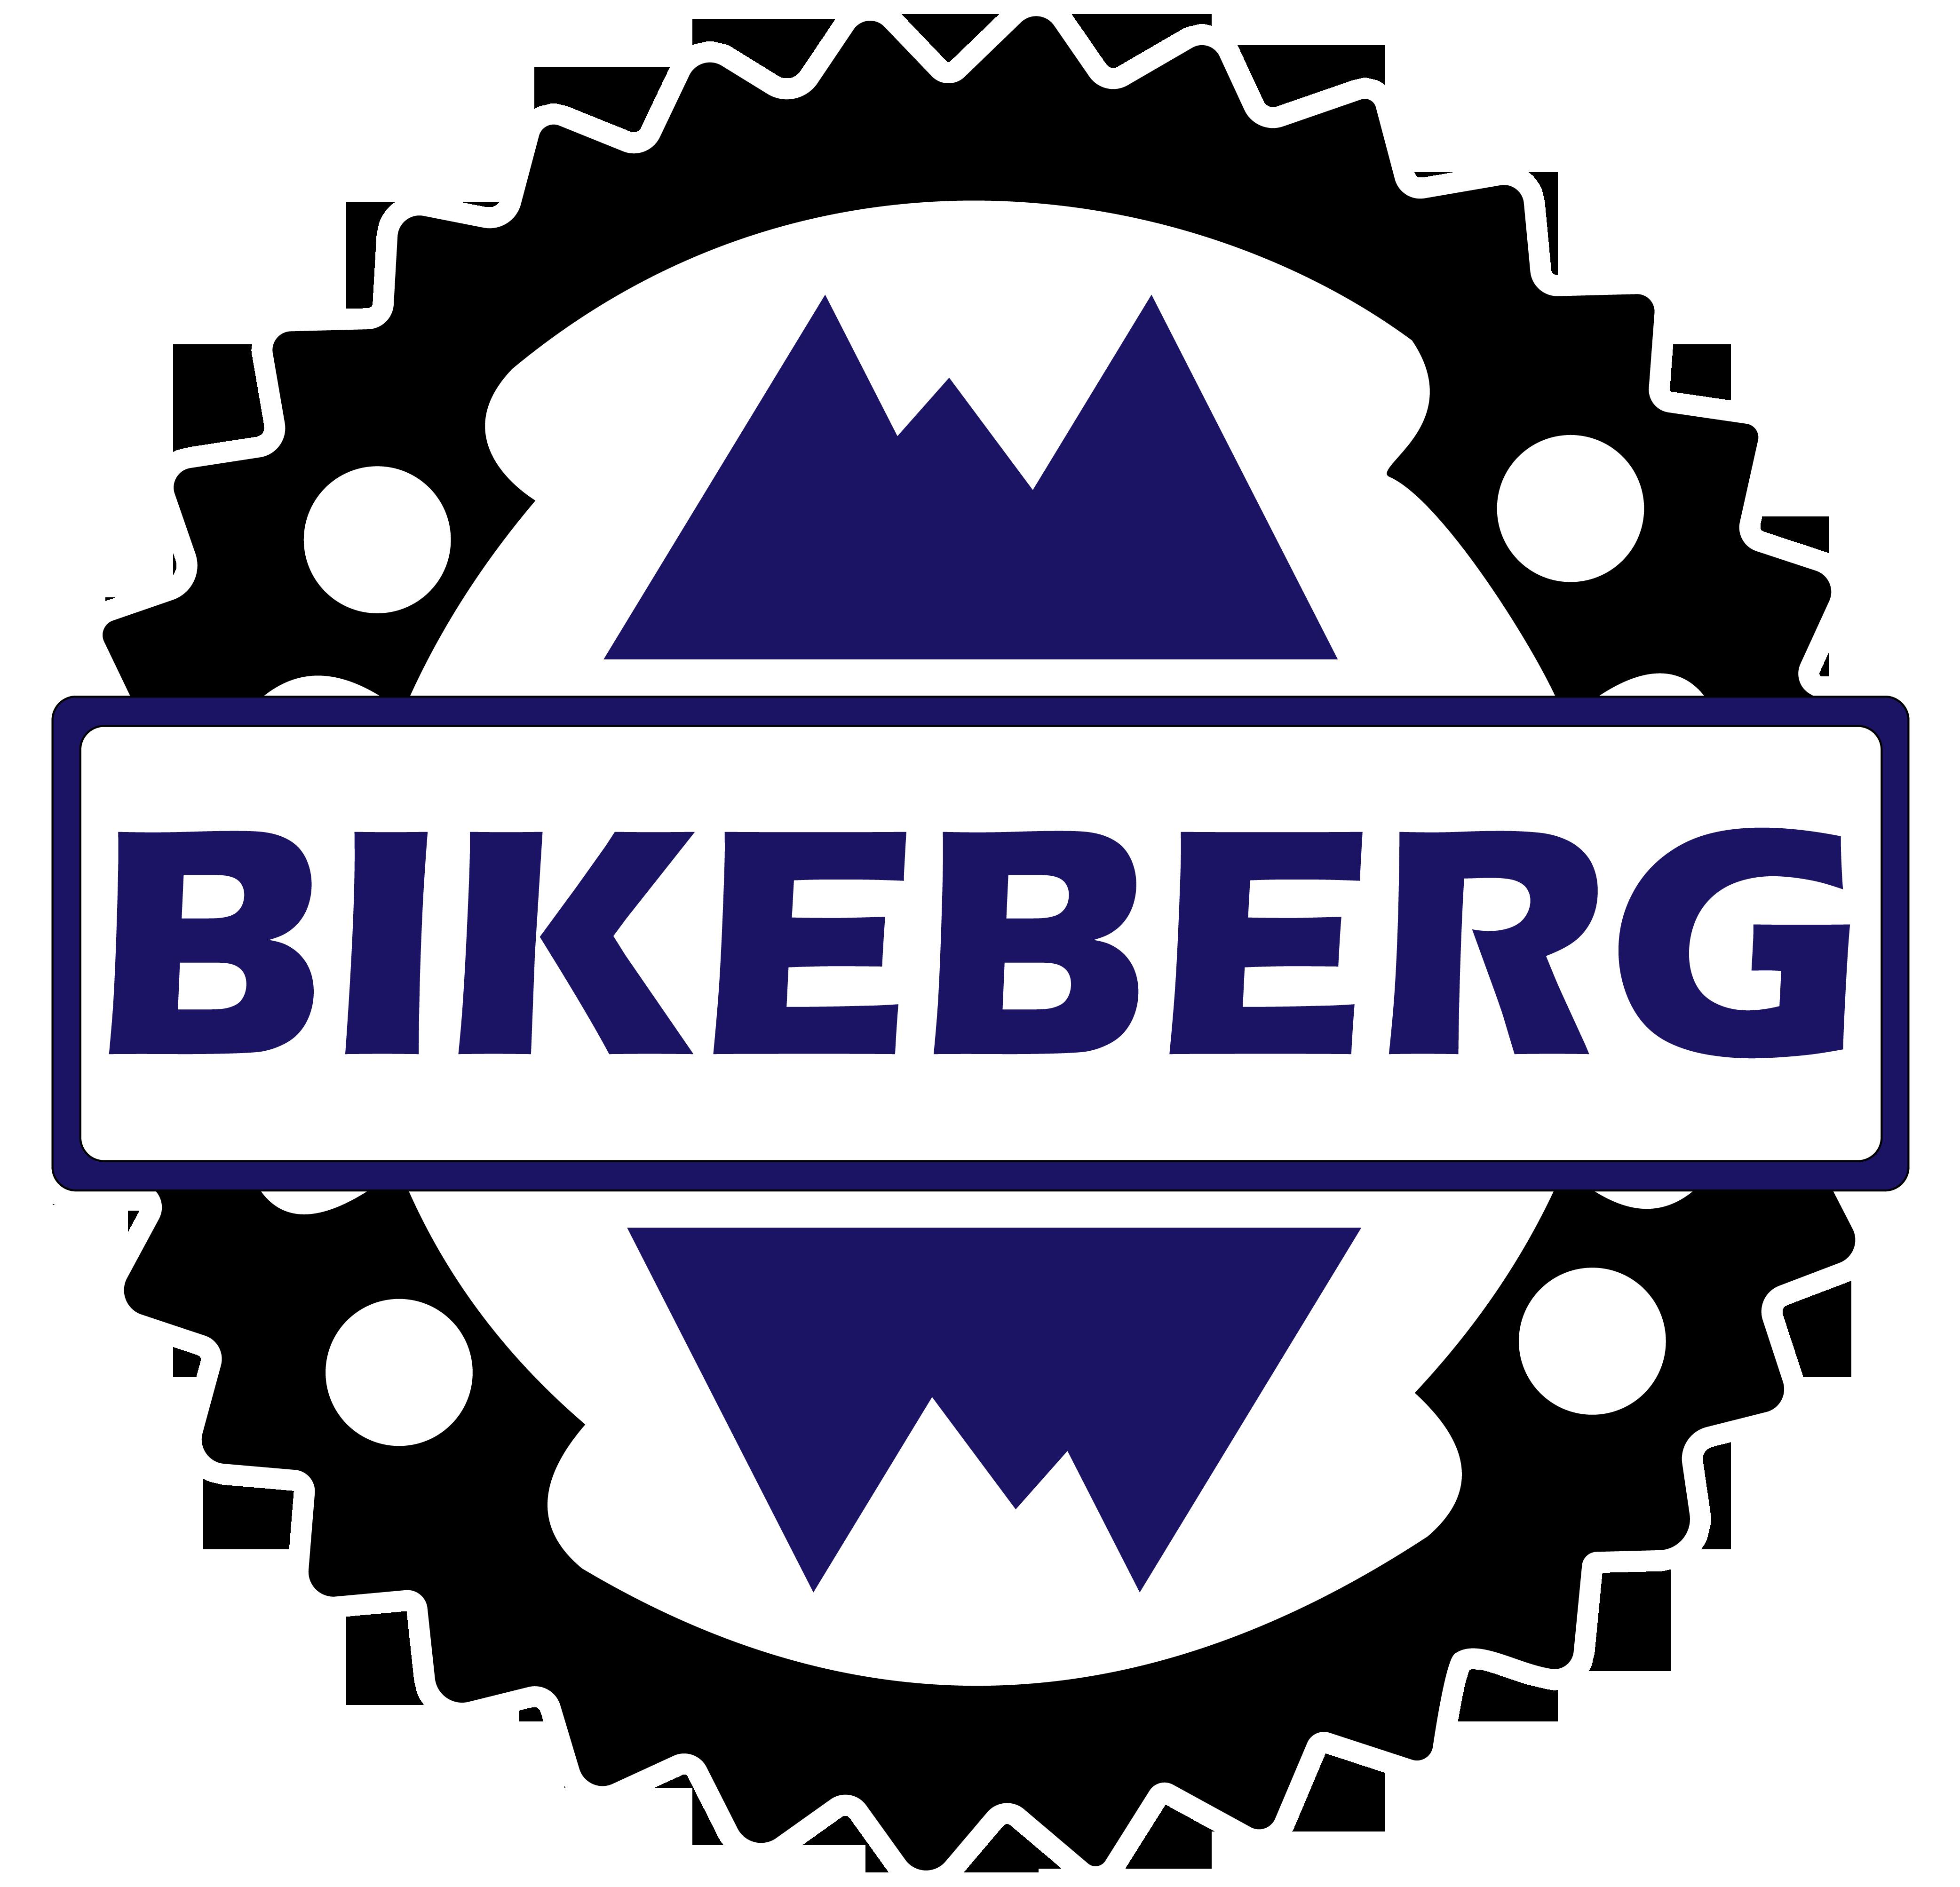 Bikeberg